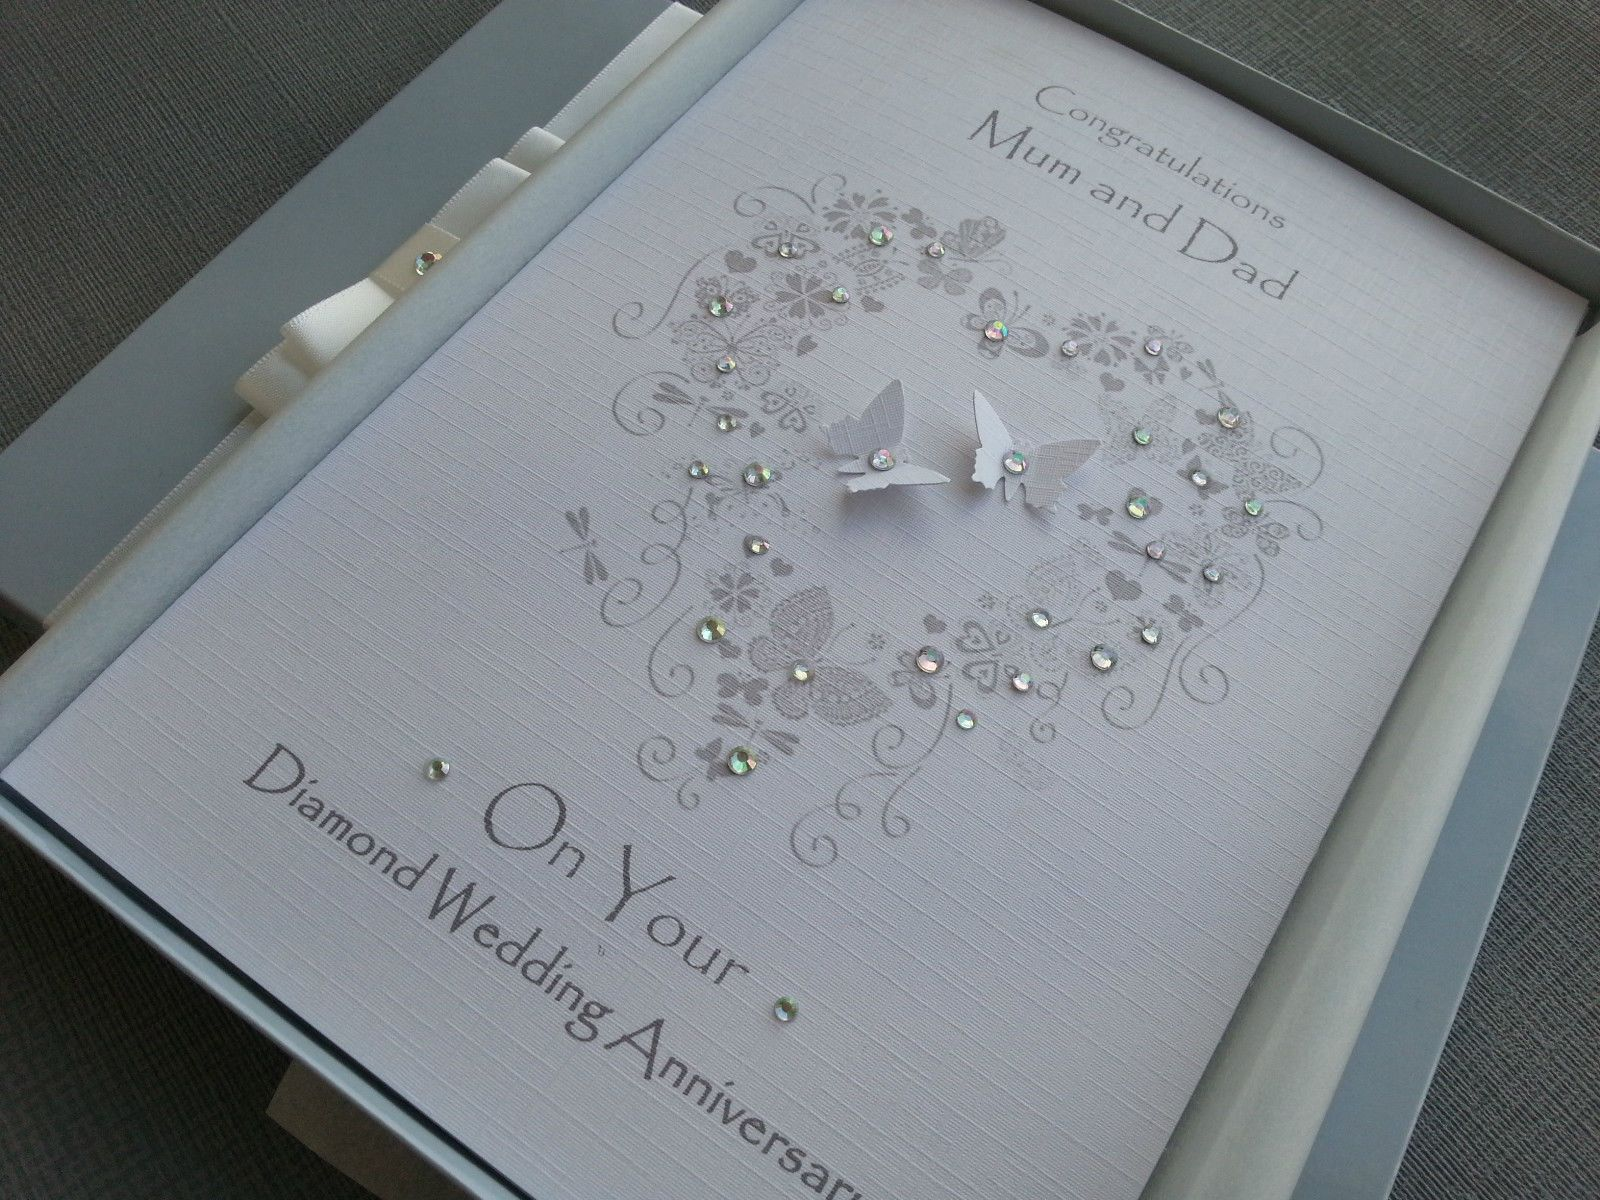 Diamond 60th Wedding Anniversary Card Handmade Personalised Box Envel Wedding Anniversary Cards Anniversary Cards Handmade Diamond Wedding Anniversary Cards